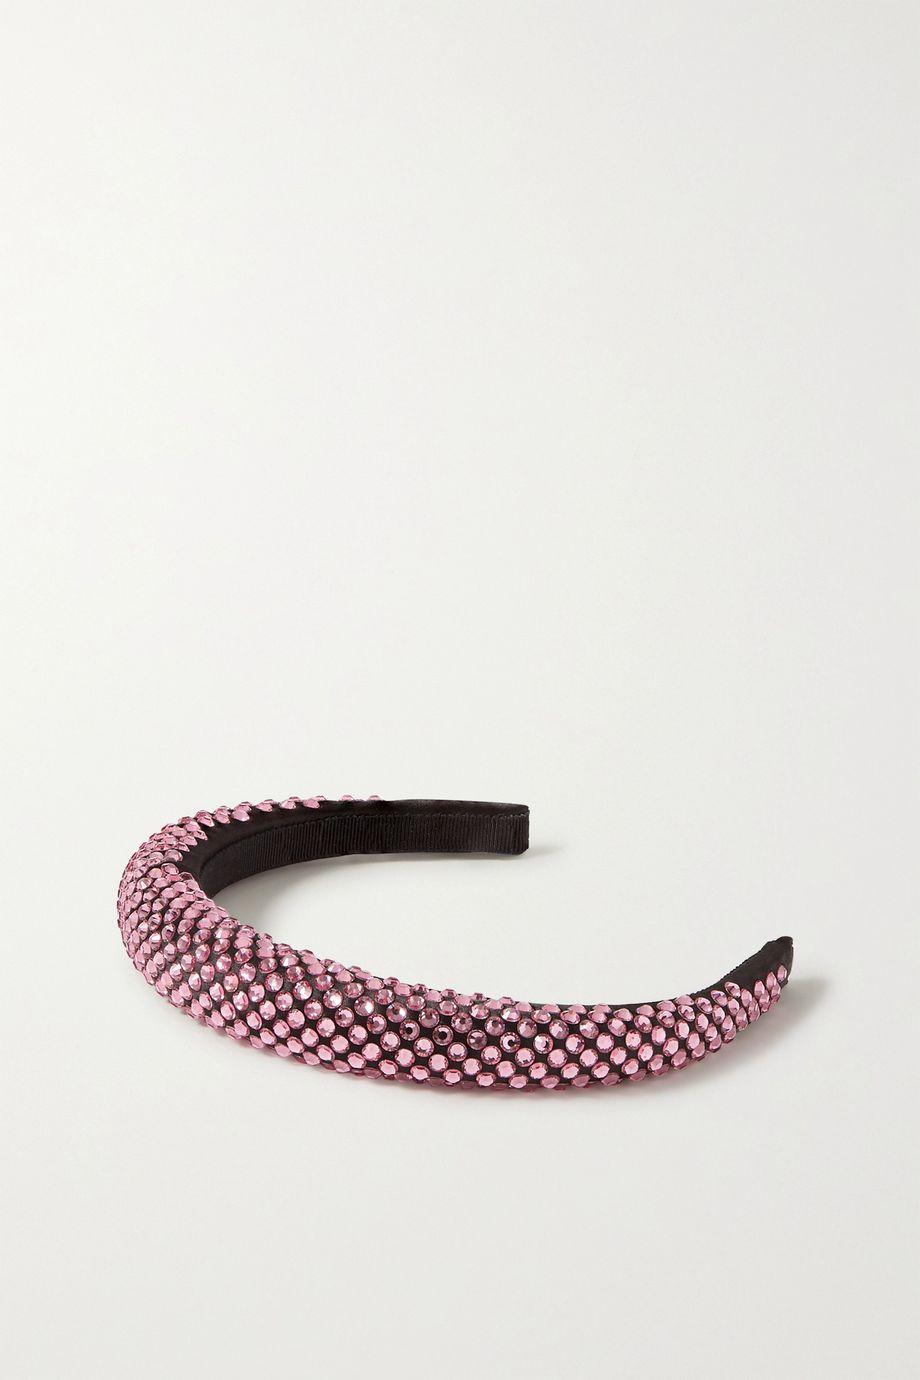 Prada 水晶缀饰缎布发箍